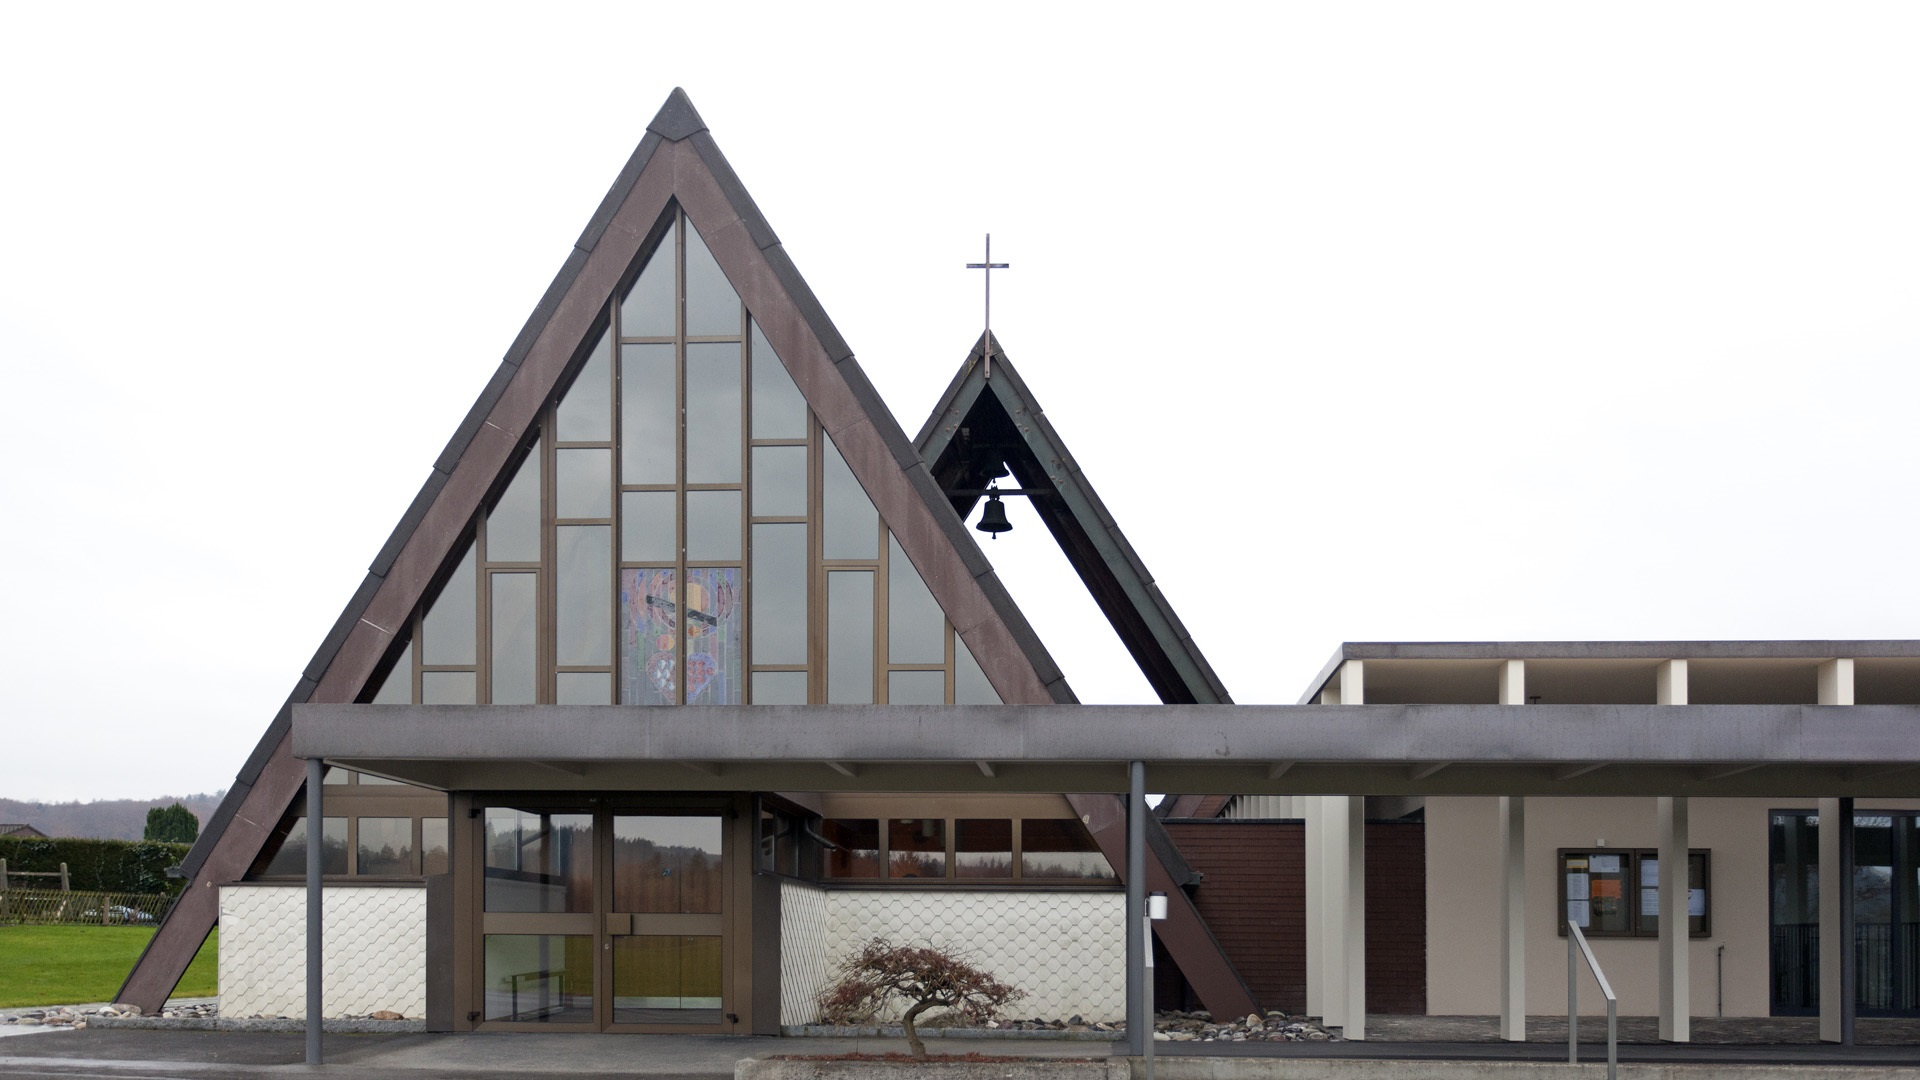 Seon, St. Theresia v. K. J. | © Roger Wehrli